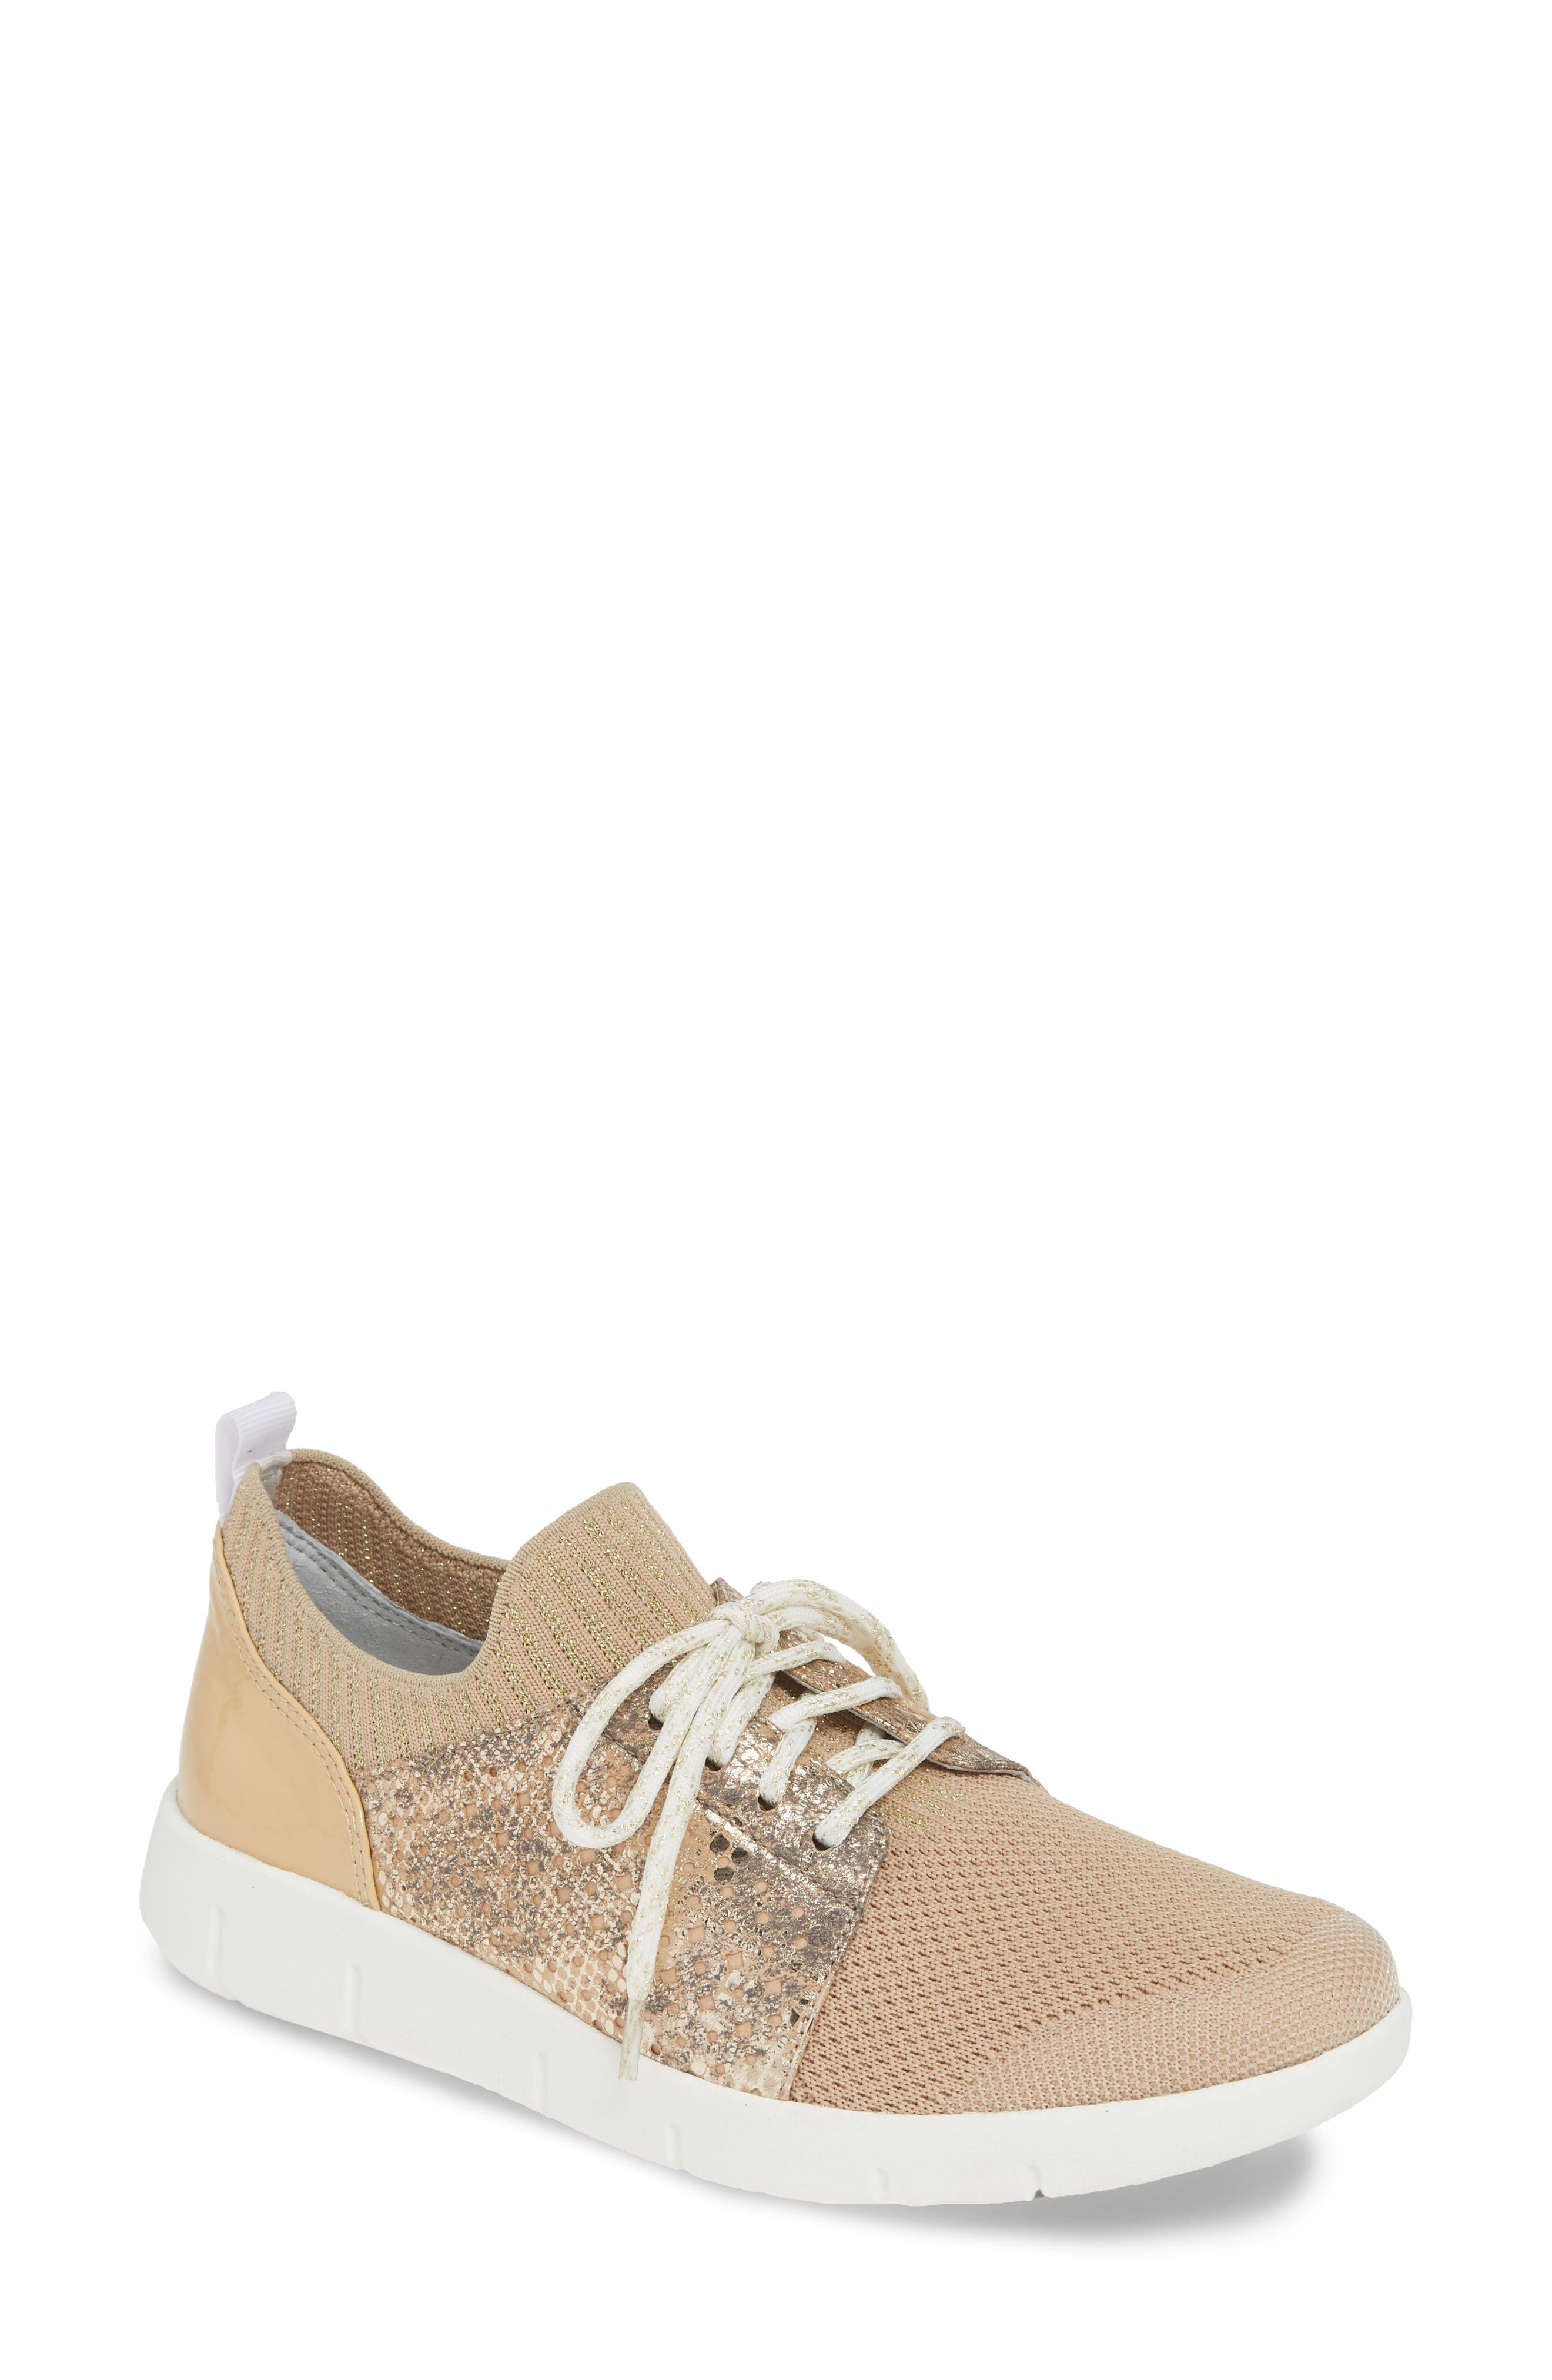 Johnston & Murphy Tamara Sneaker- Beige